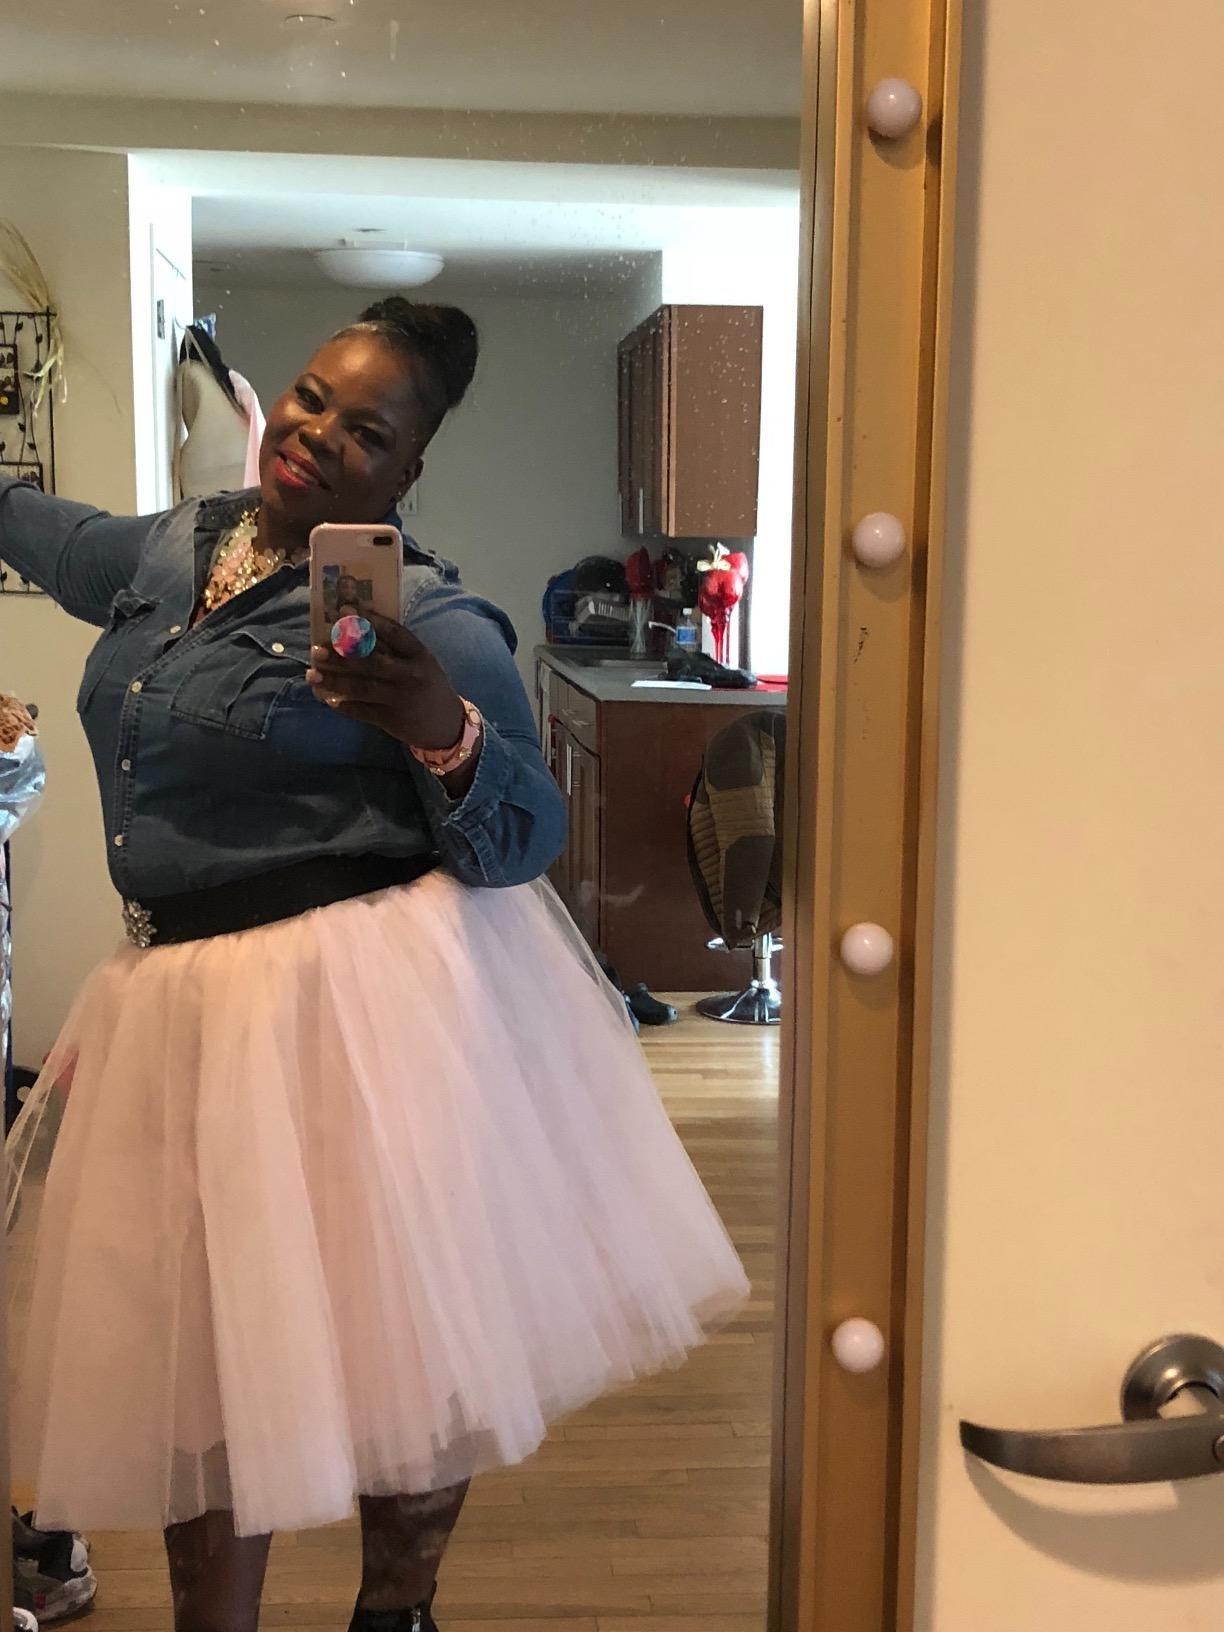 reviewer takes selfies wearing pink tulle skirt